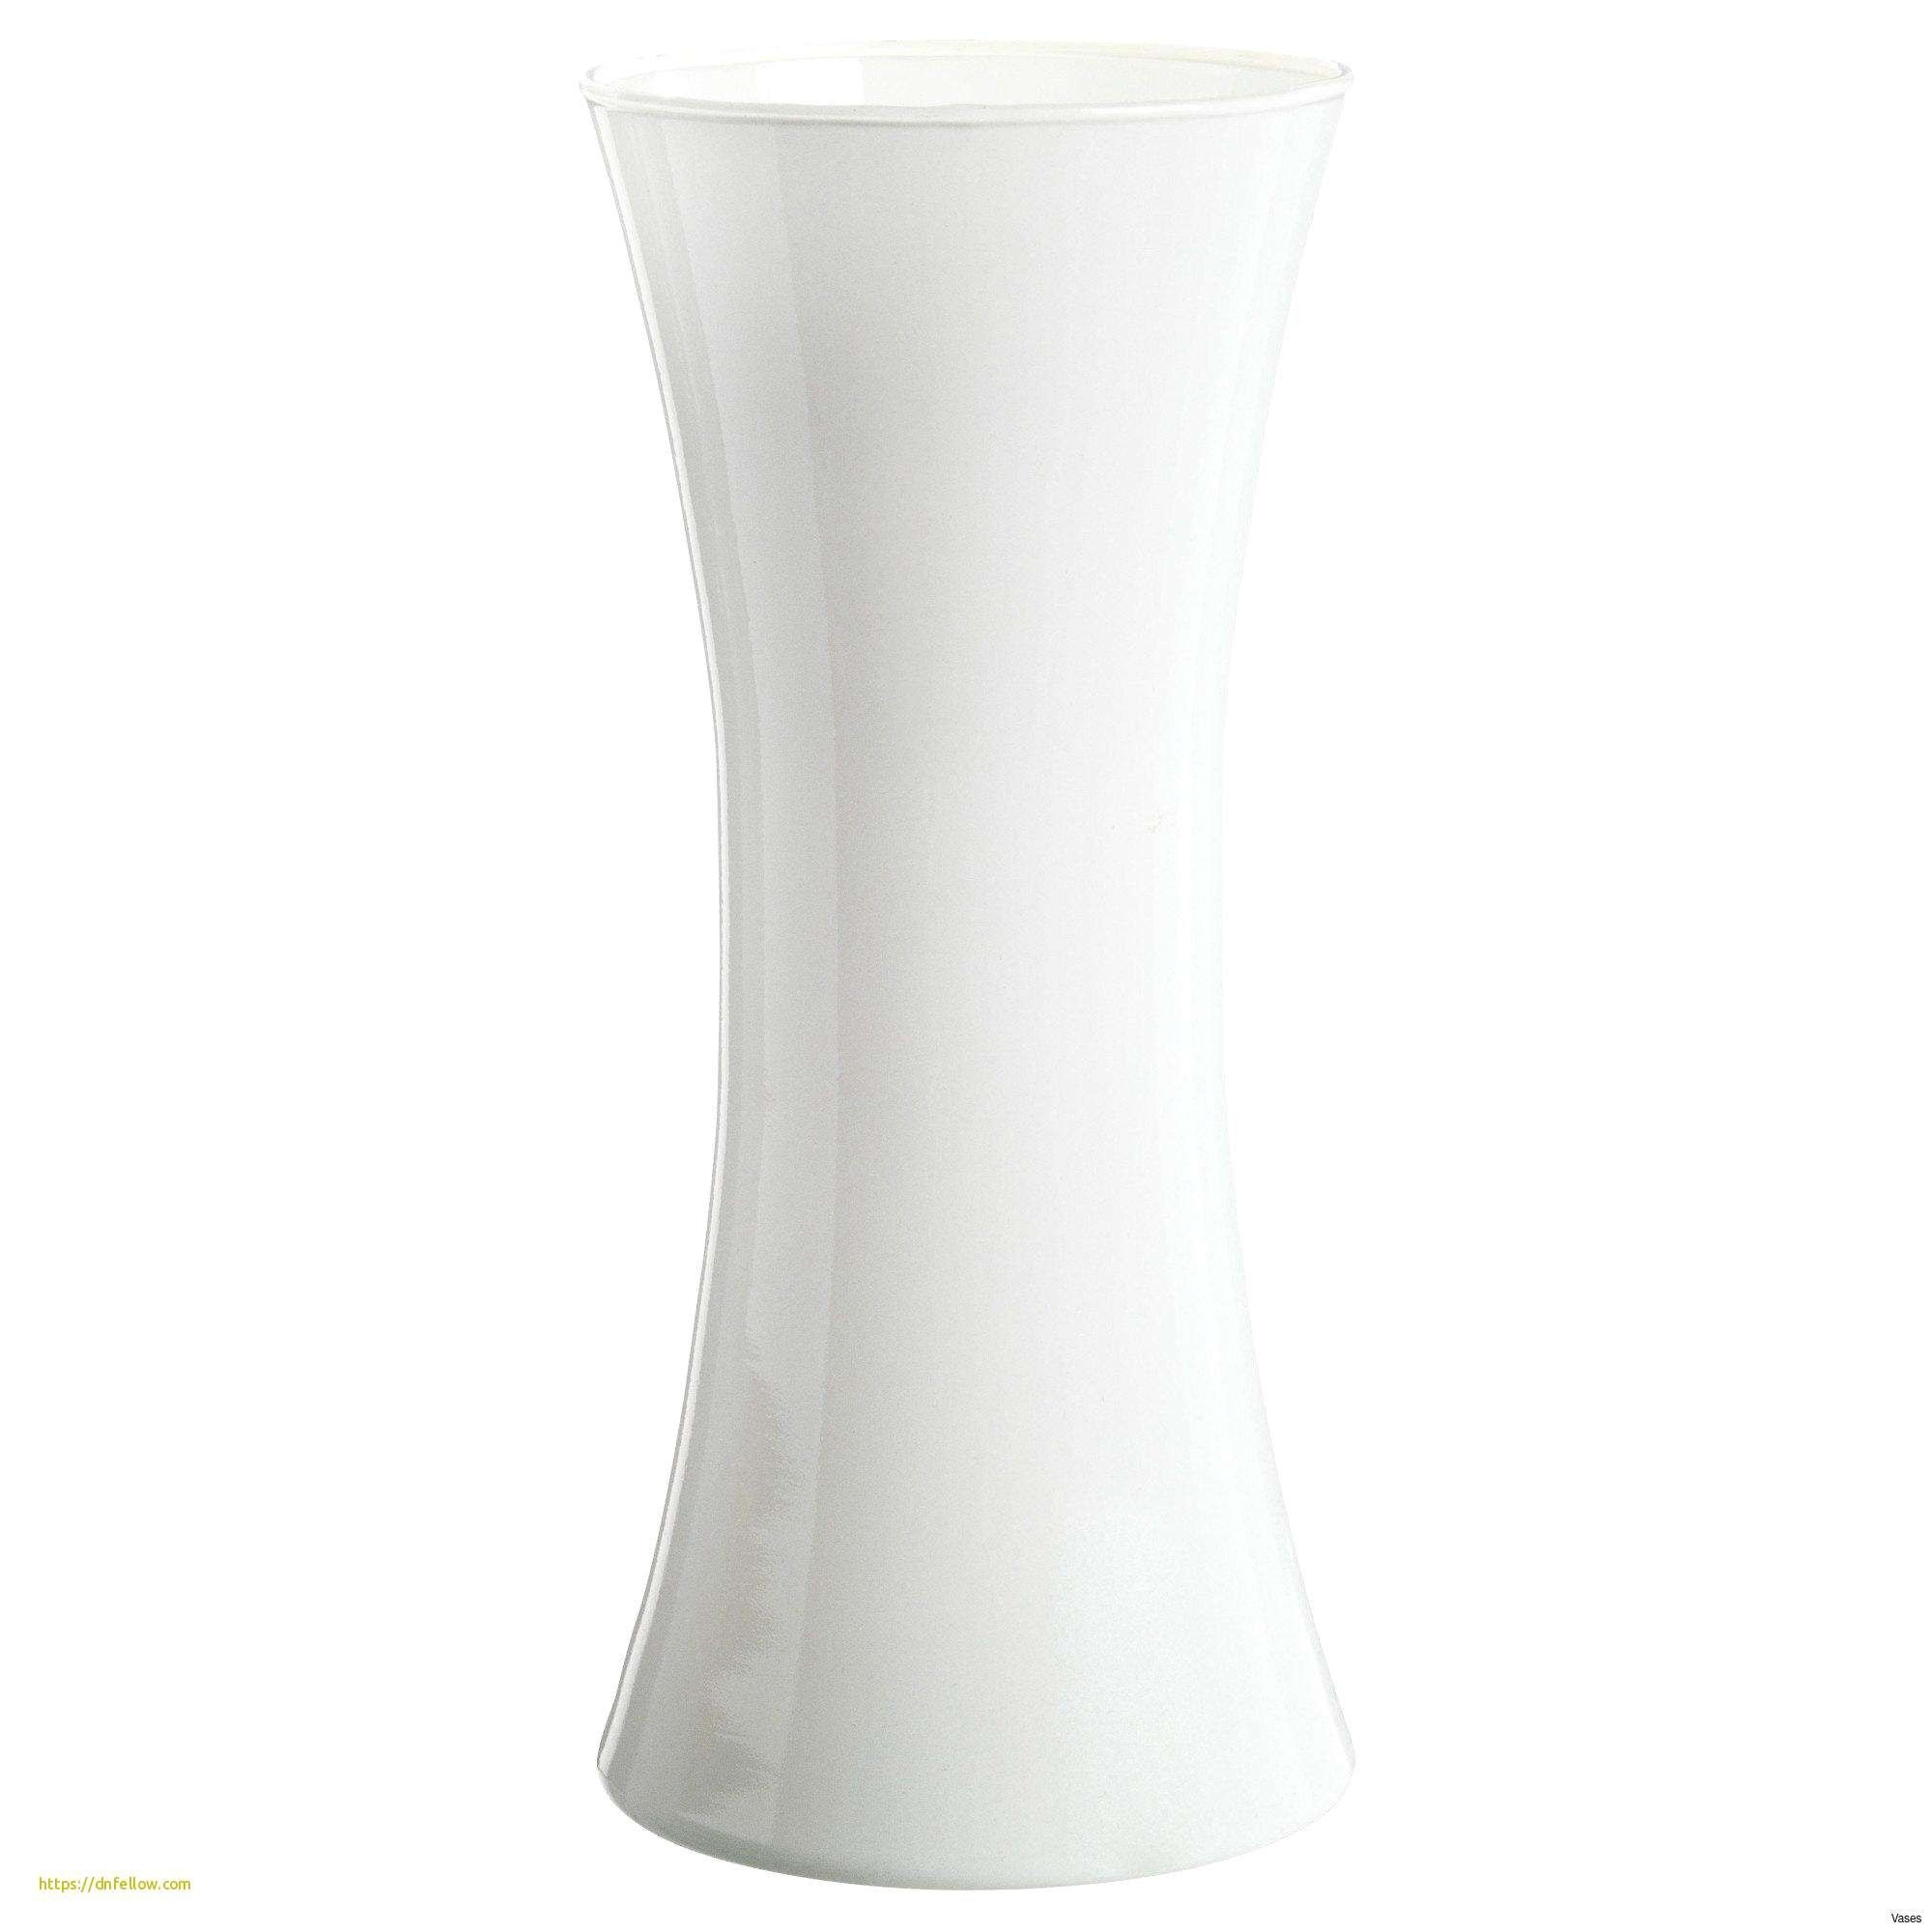 grey vase set of white vase set new white floor vase ceramic modern 40 inchl home in white vase set new white floor vase ceramic modern 40 inchl home design ikea inch